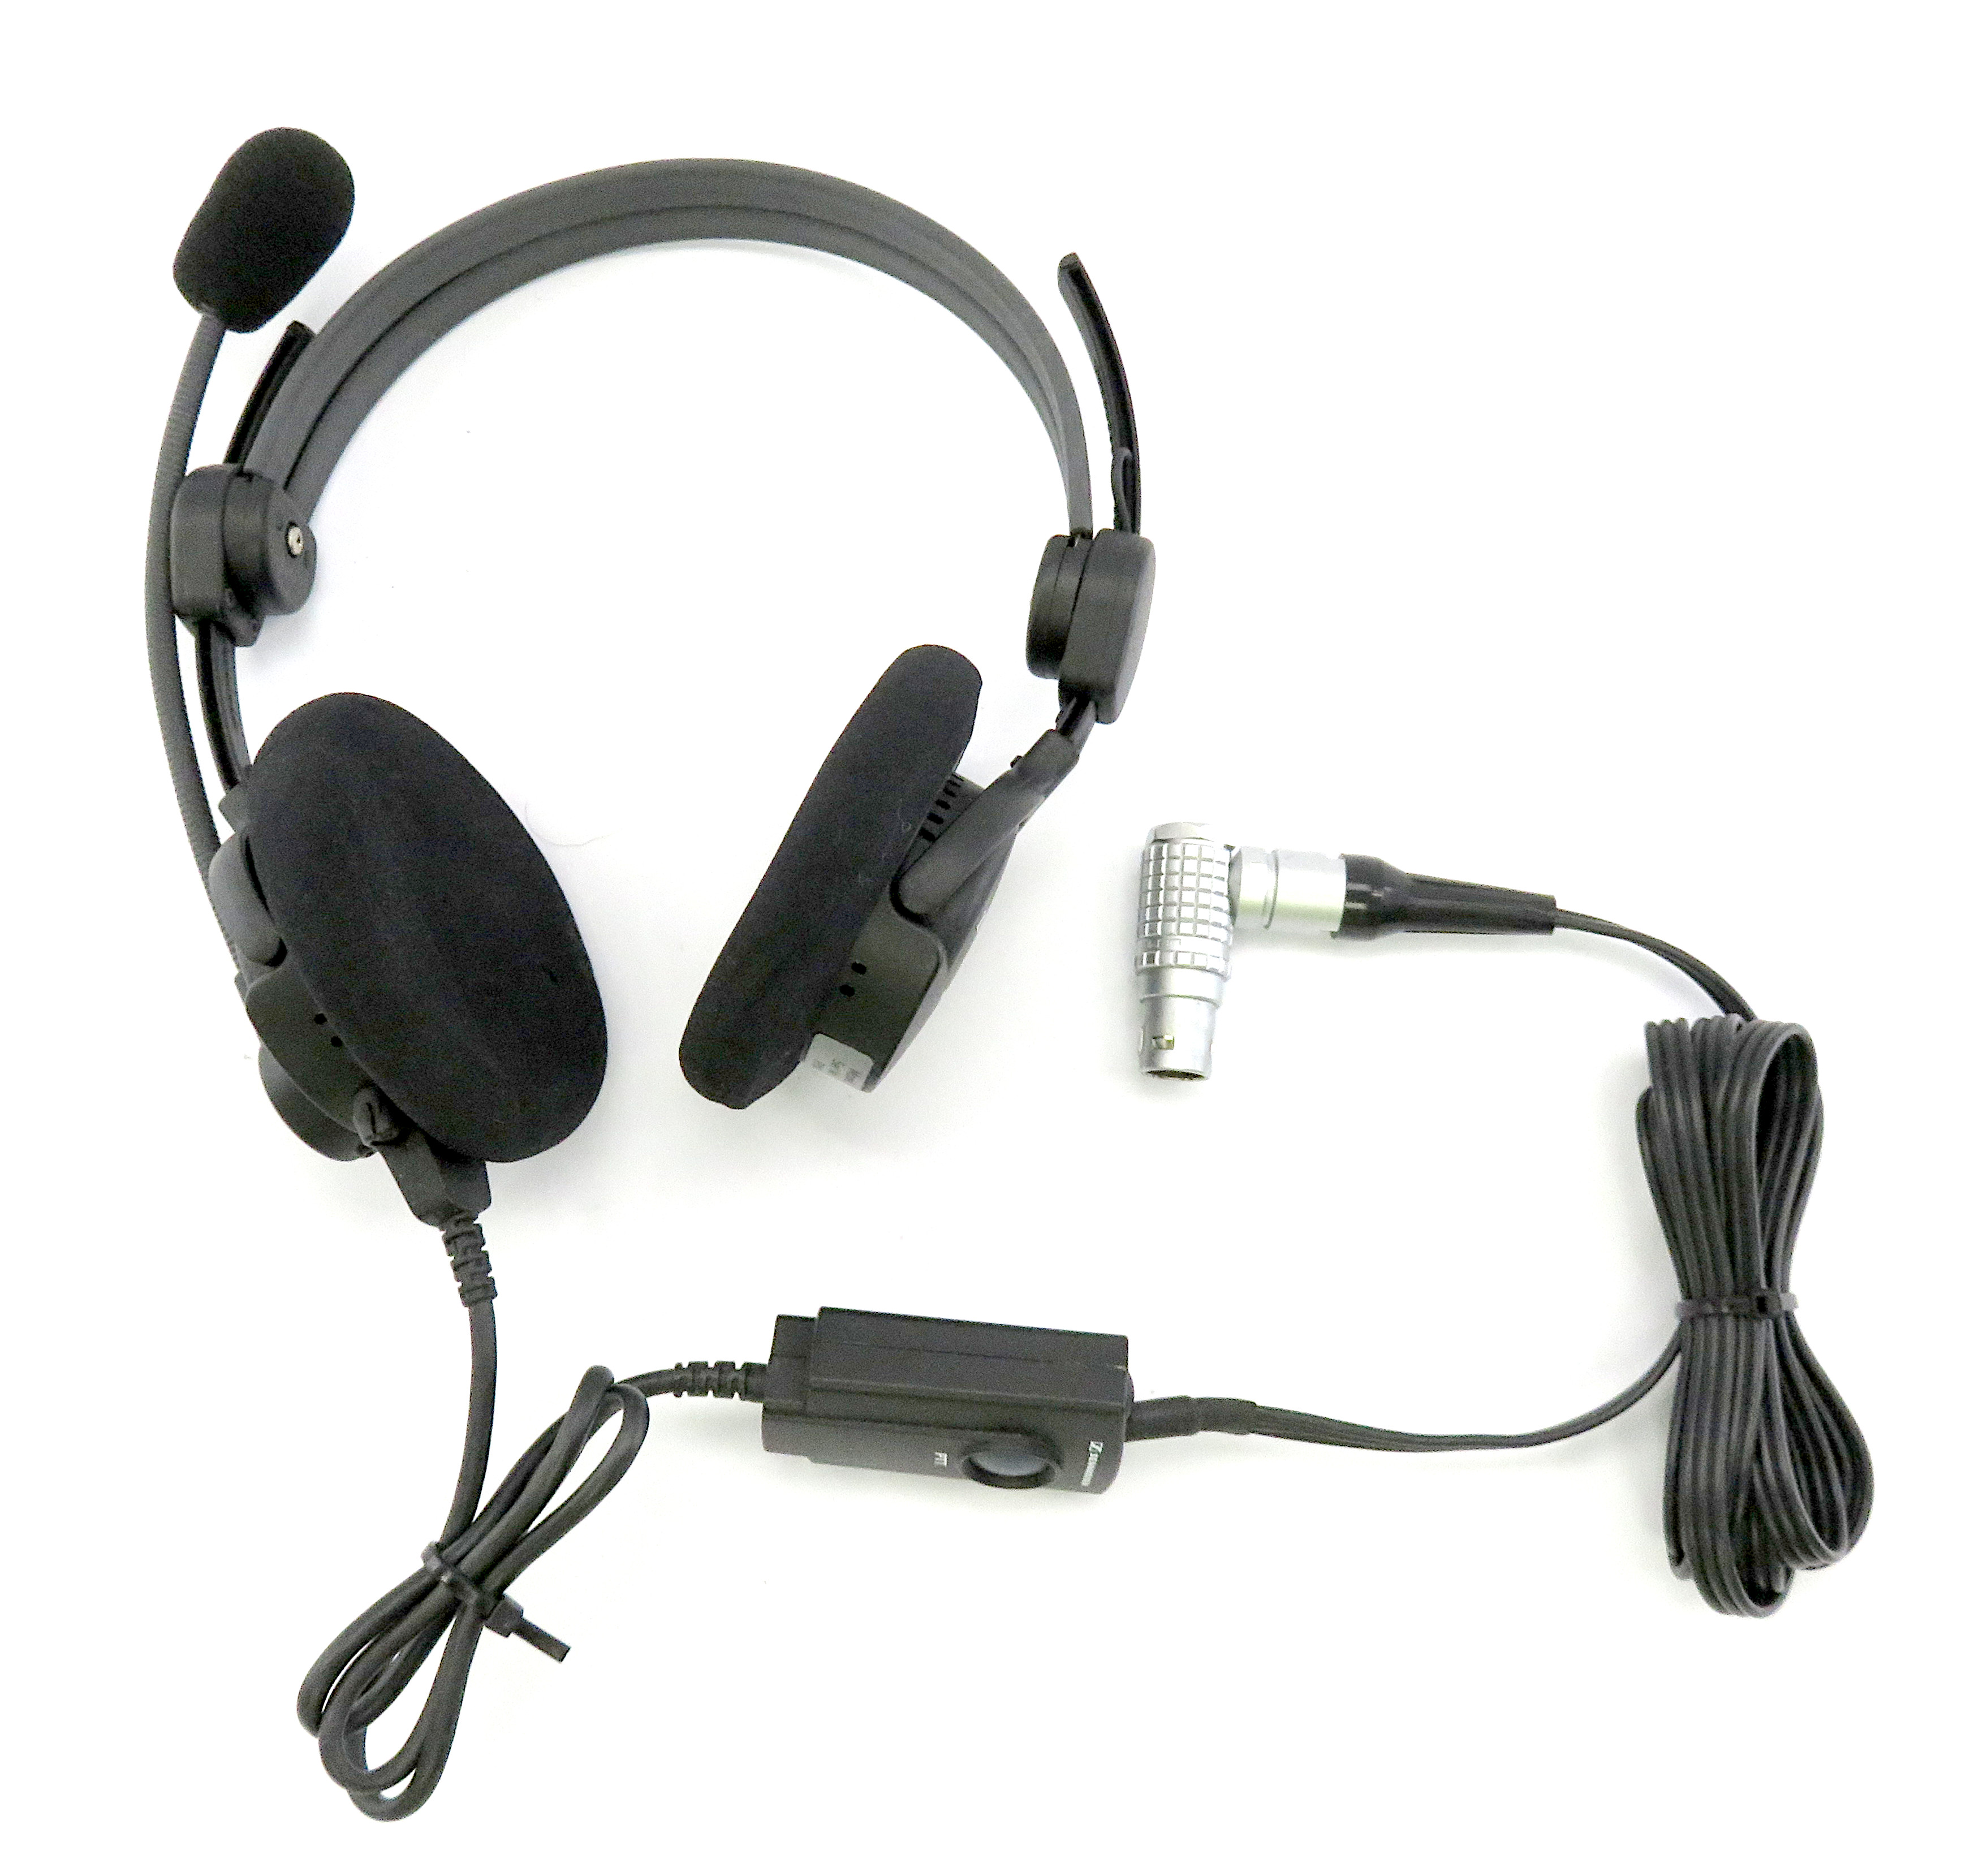 Sennheiser HME 46-3 ATC 300 Aviation Headset With CABLE-PTT-LA 046-97 / 999-0A26